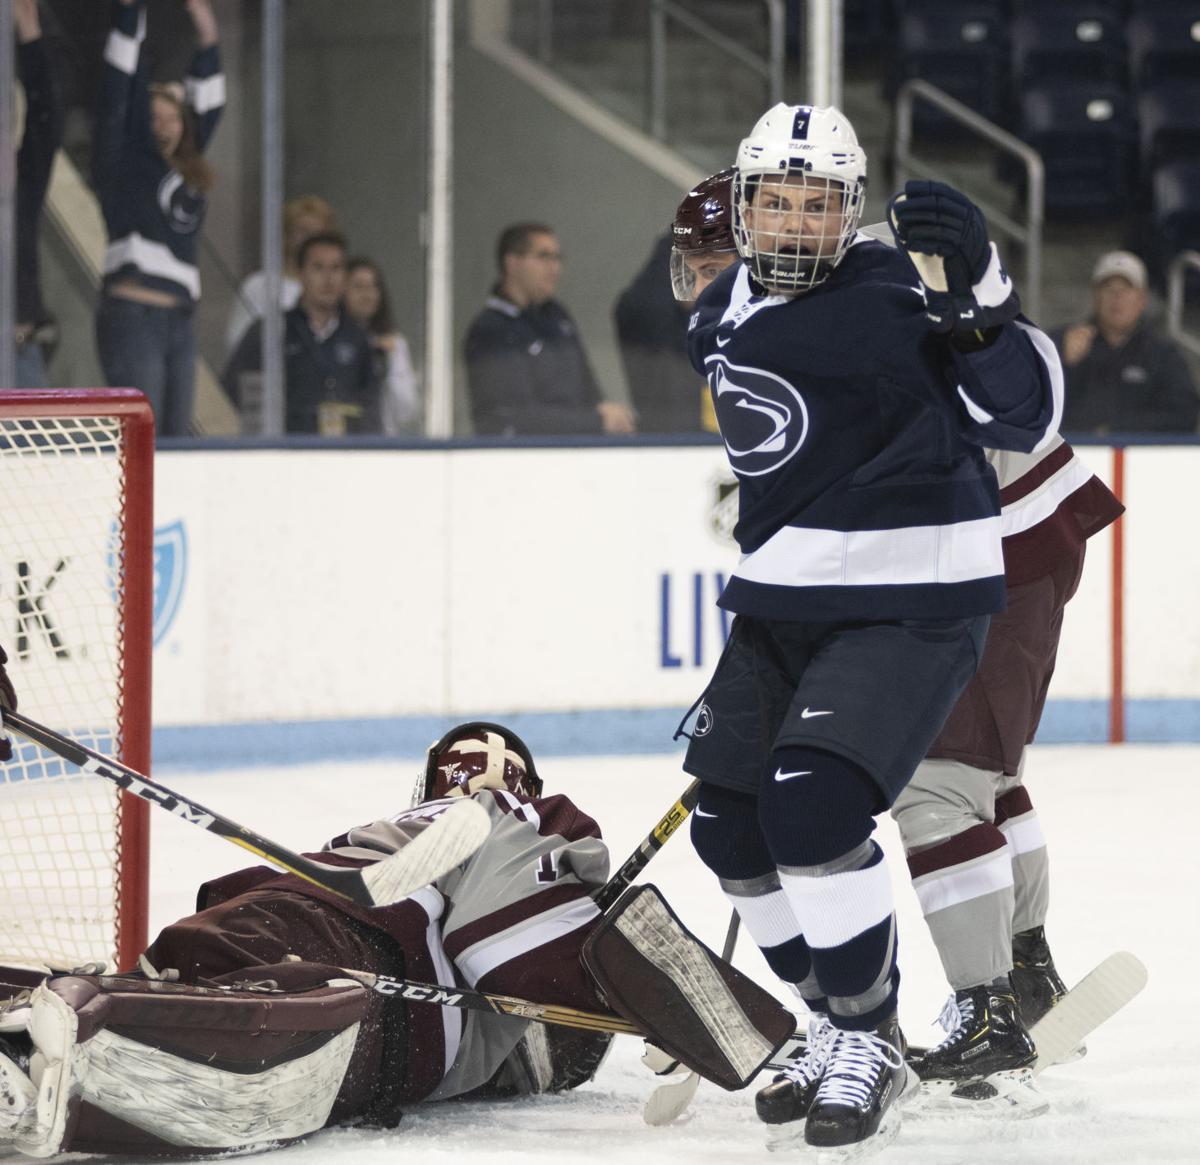 Men's hockey vs. Ottawa, Bell (7)